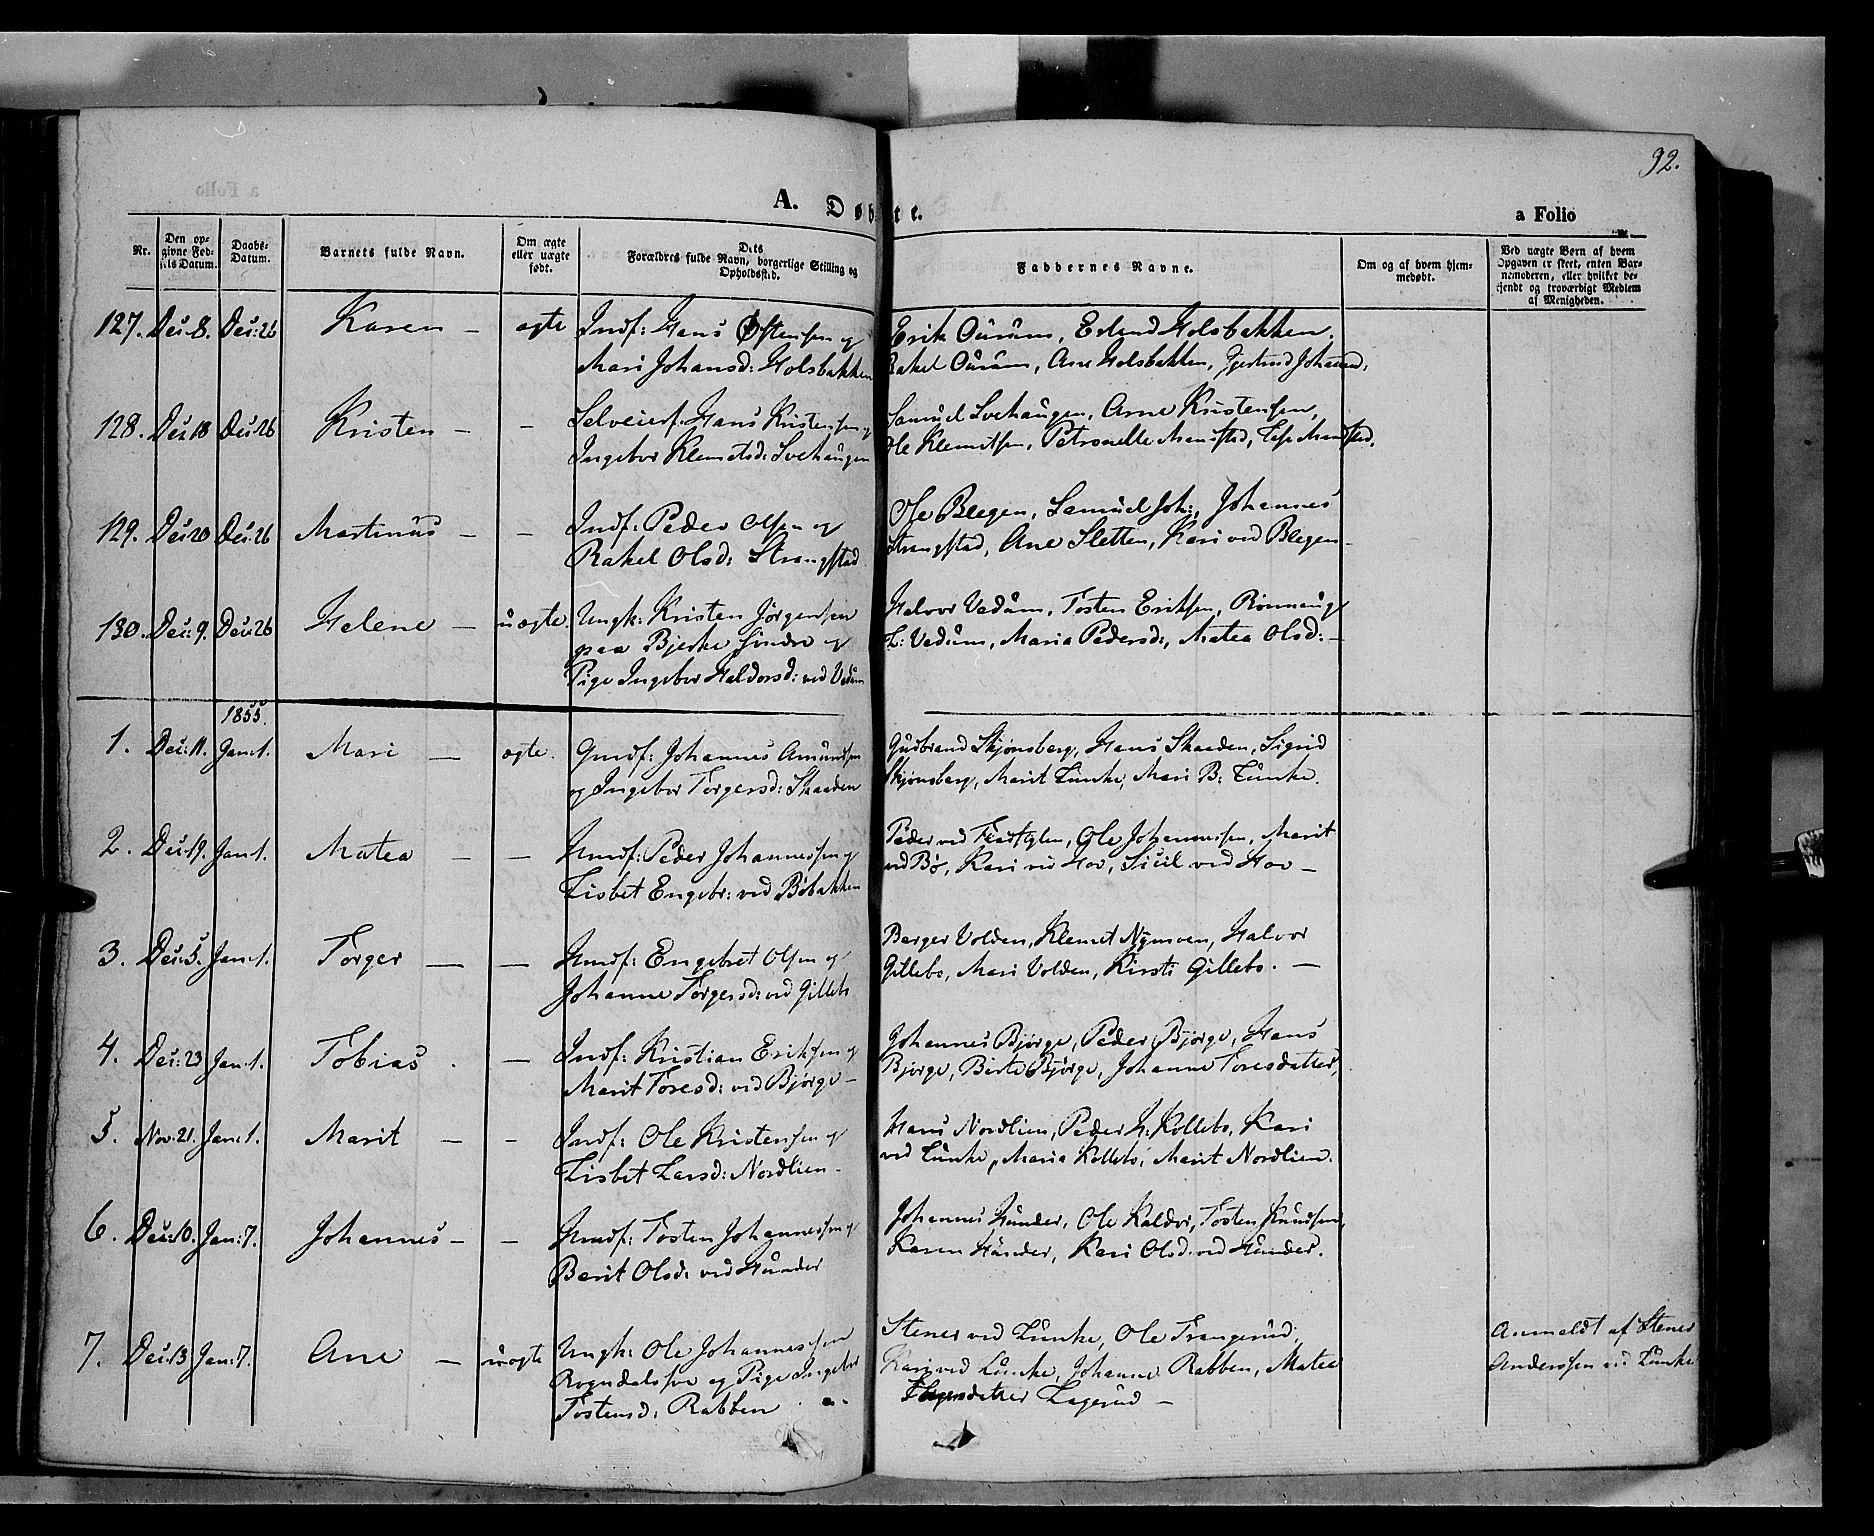 SAH, Øyer prestekontor, Ministerialbok nr. 5, 1842-1857, s. 92